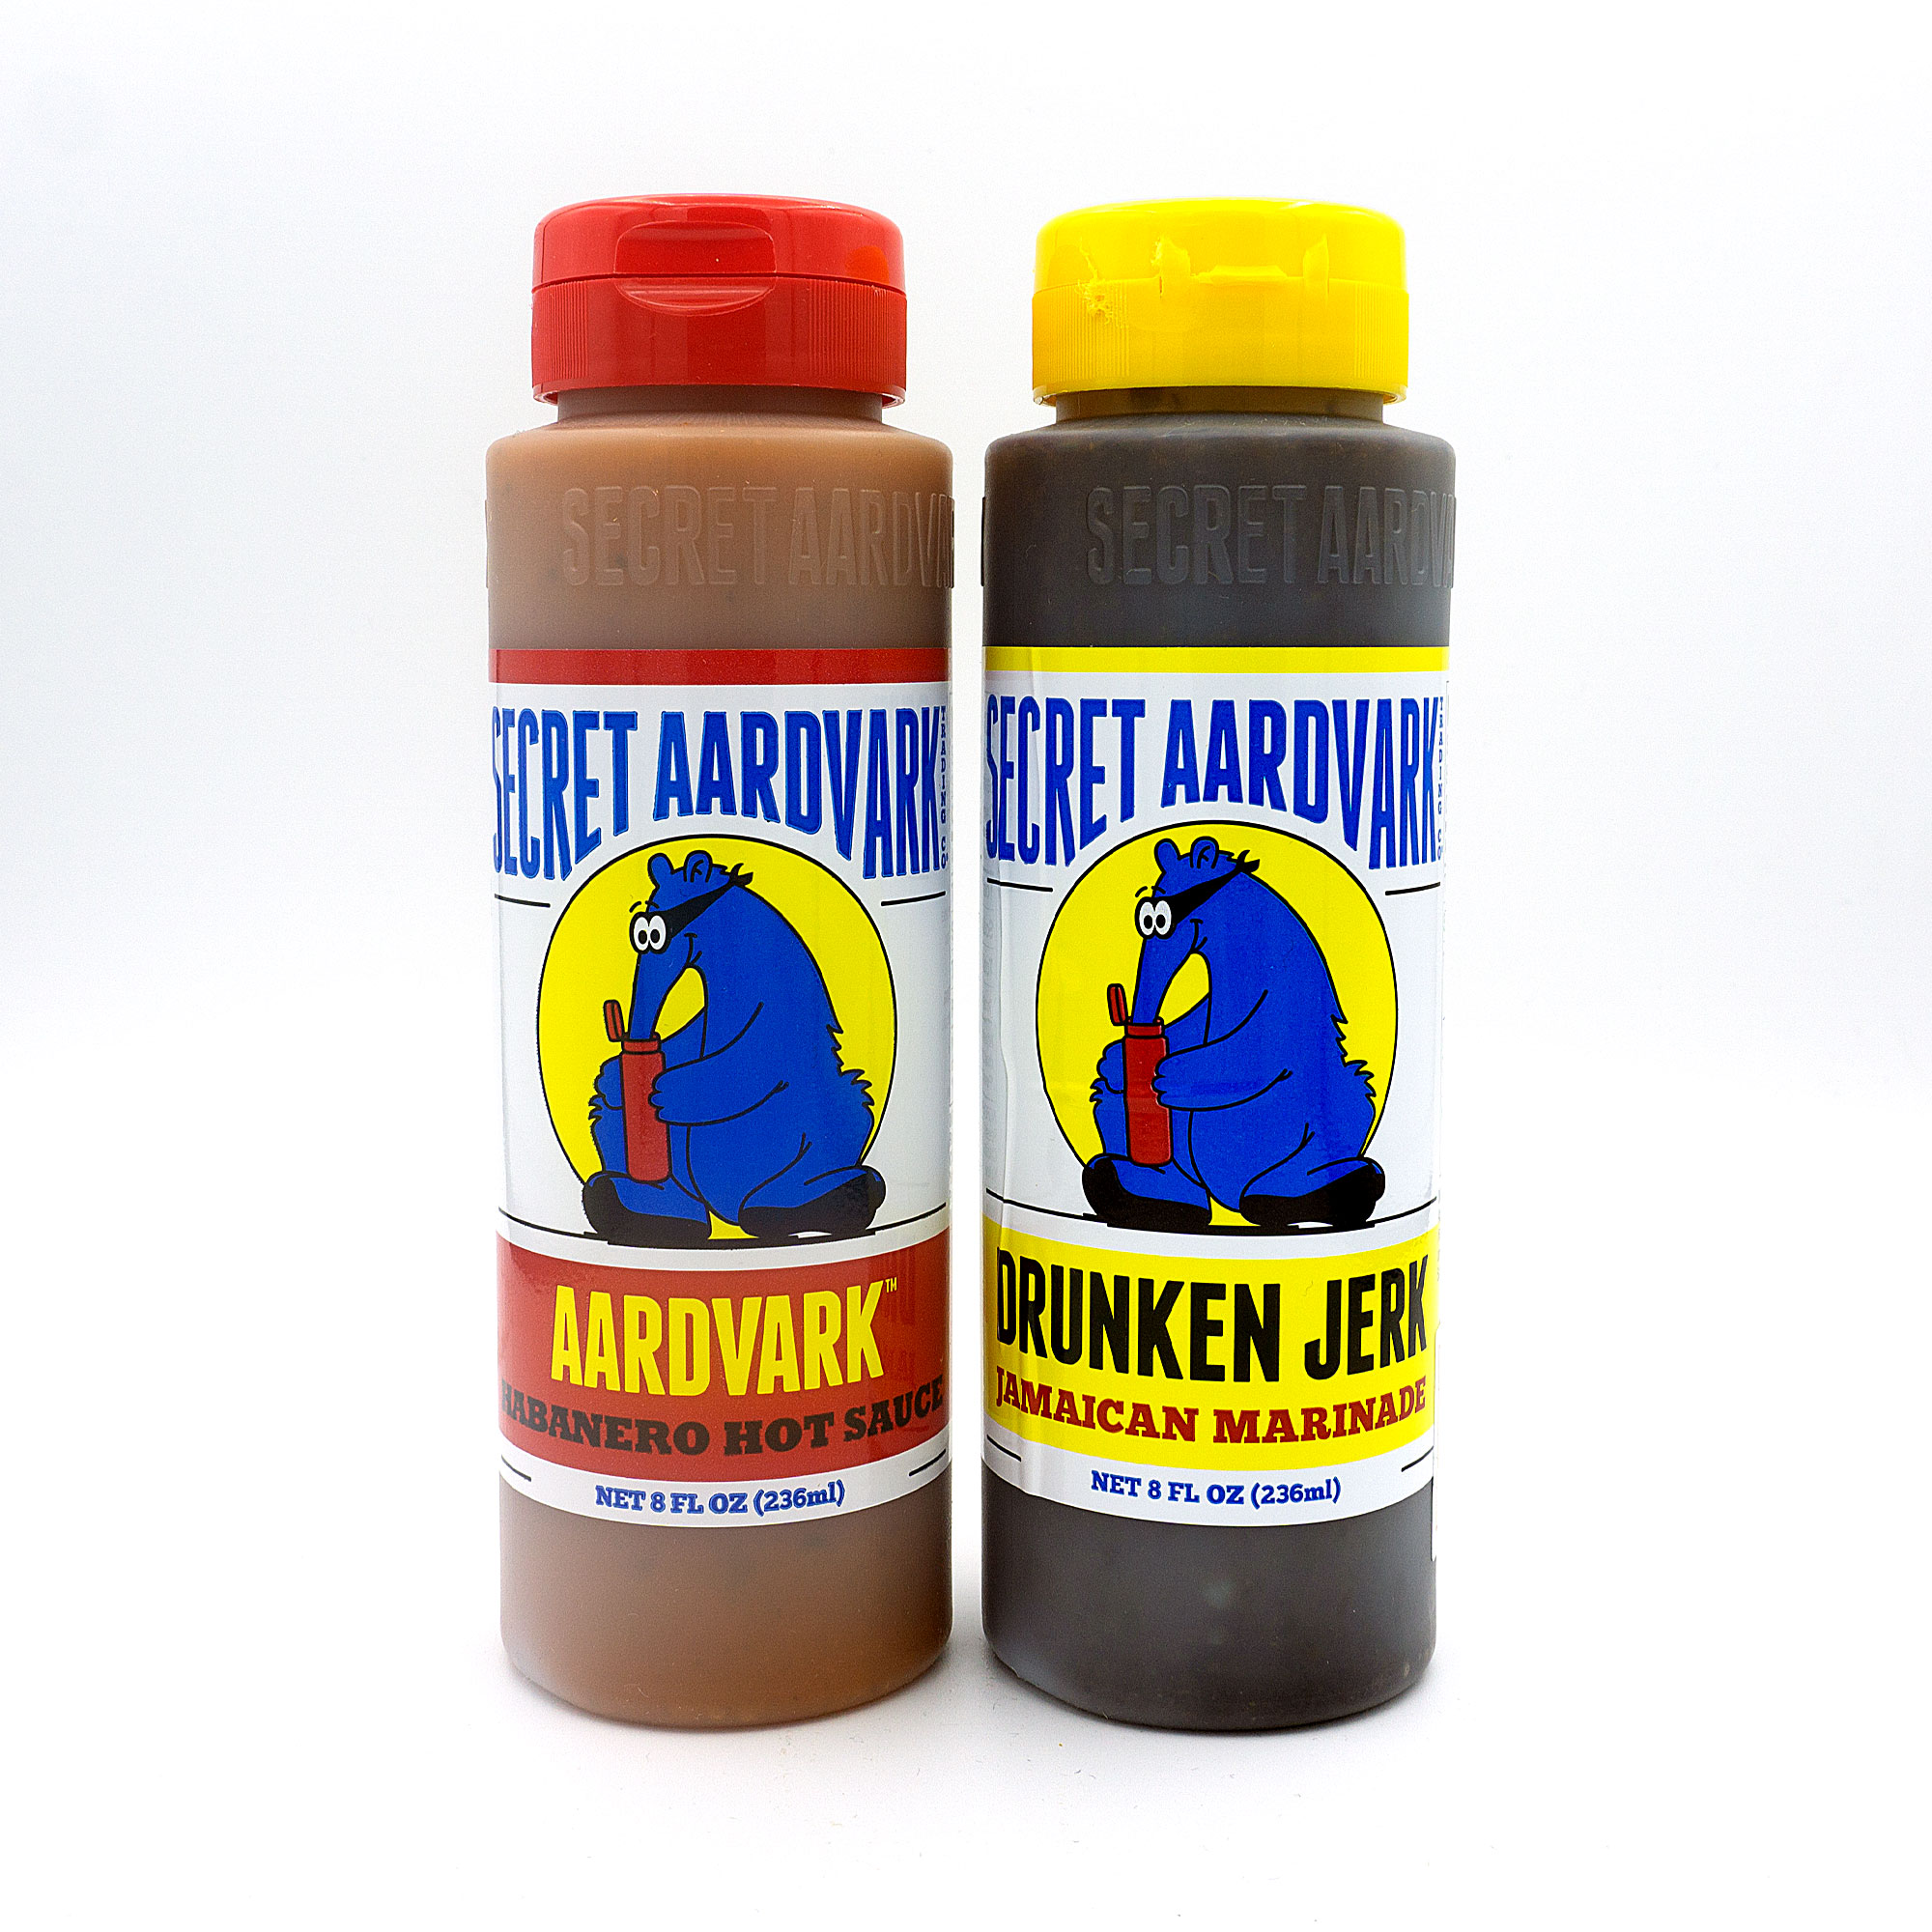 Secret Aardvark Trading Company | Mat's Hot Shop - Australia's Premier Hot Sauce Store